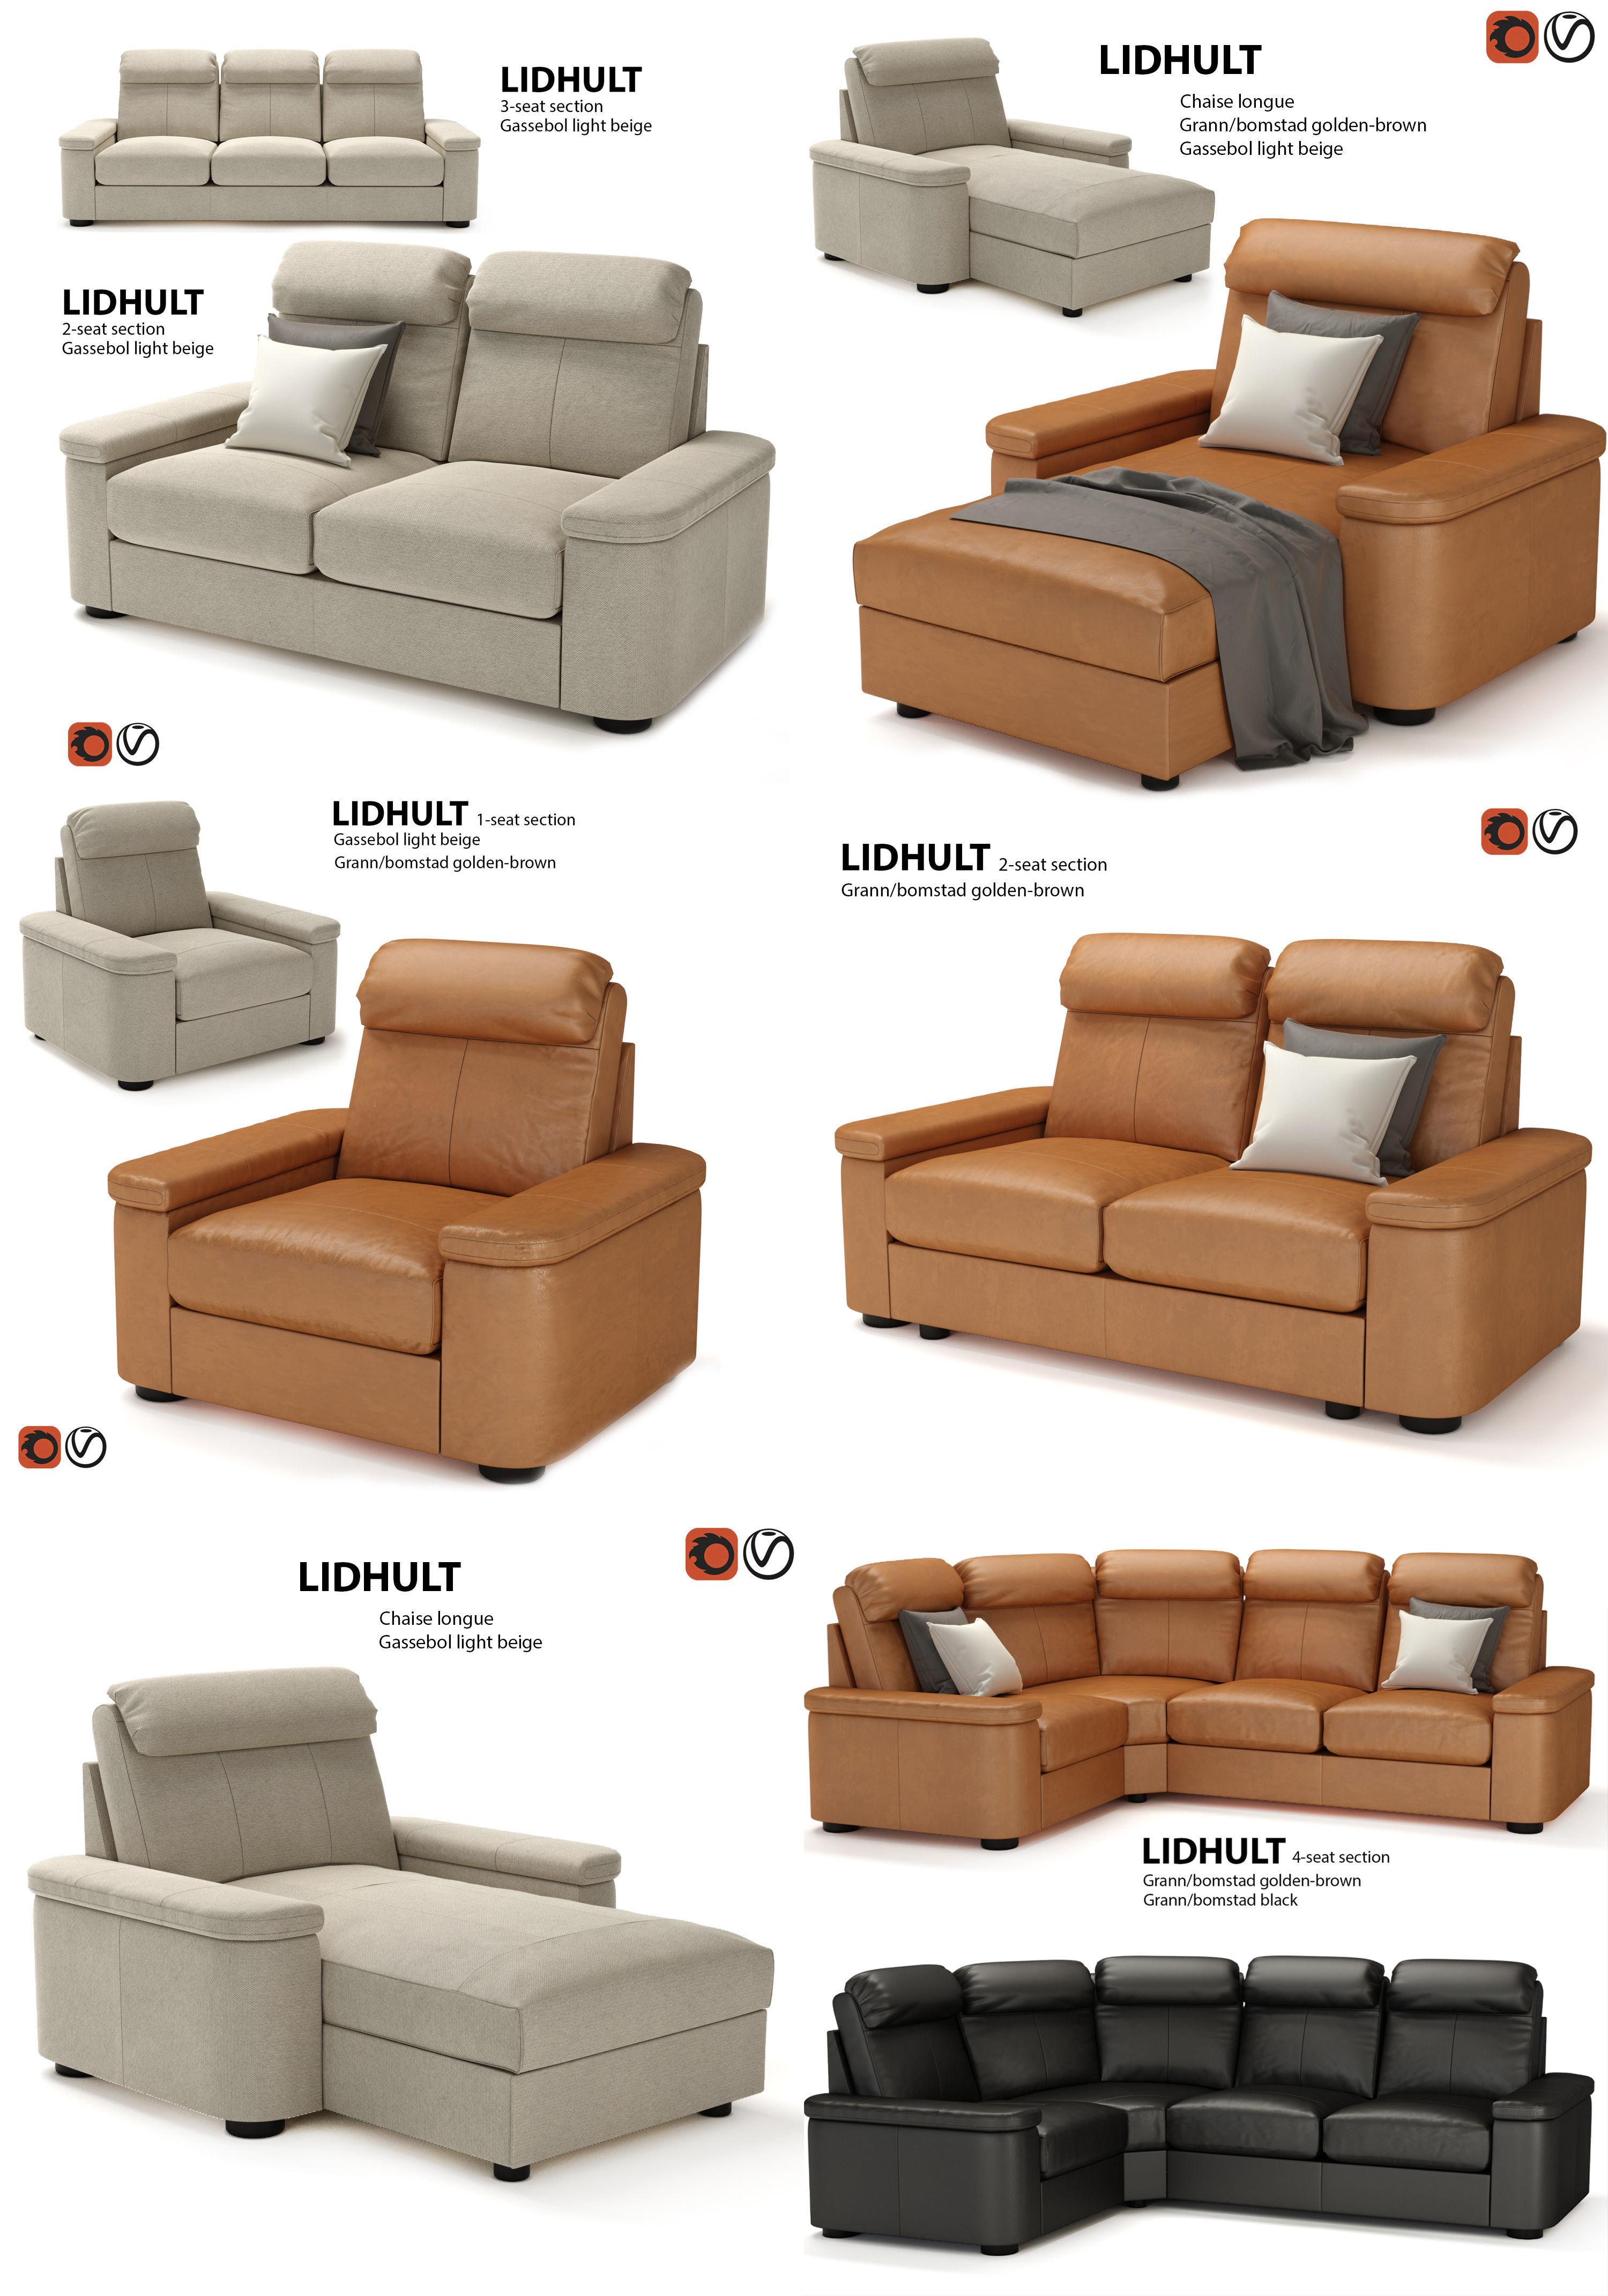 Model Set Of Furniture Ikea Lidhult